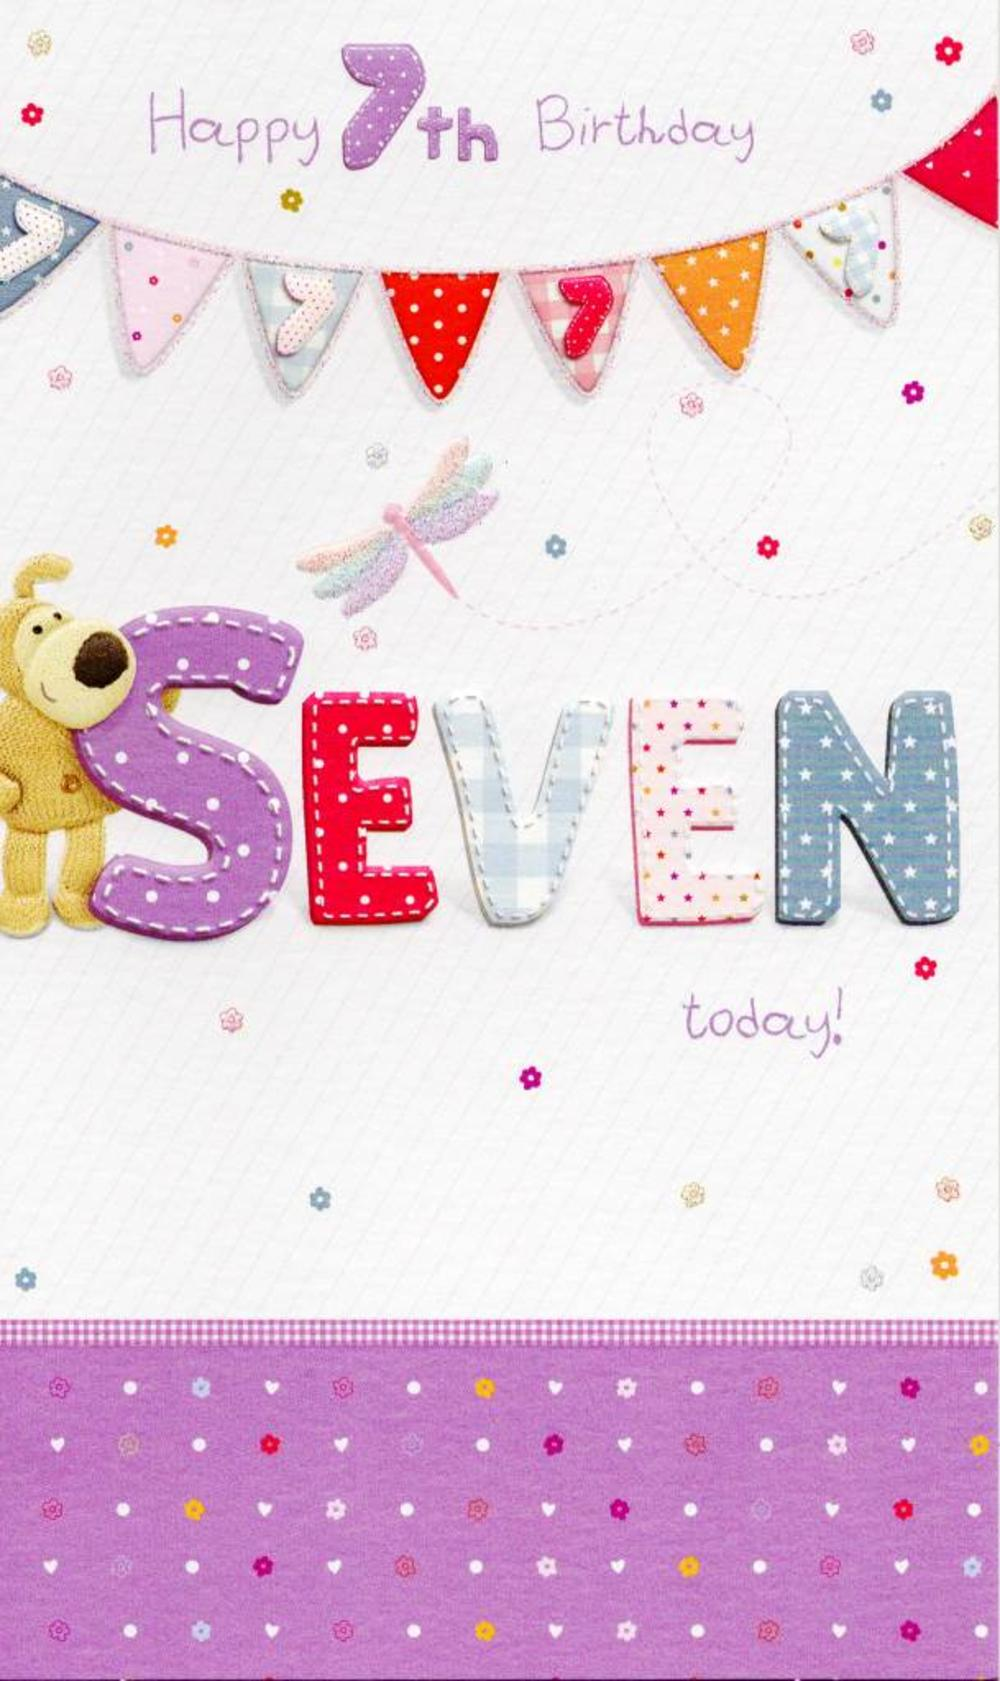 Boofle Happy 7th Birthday Greeting Card